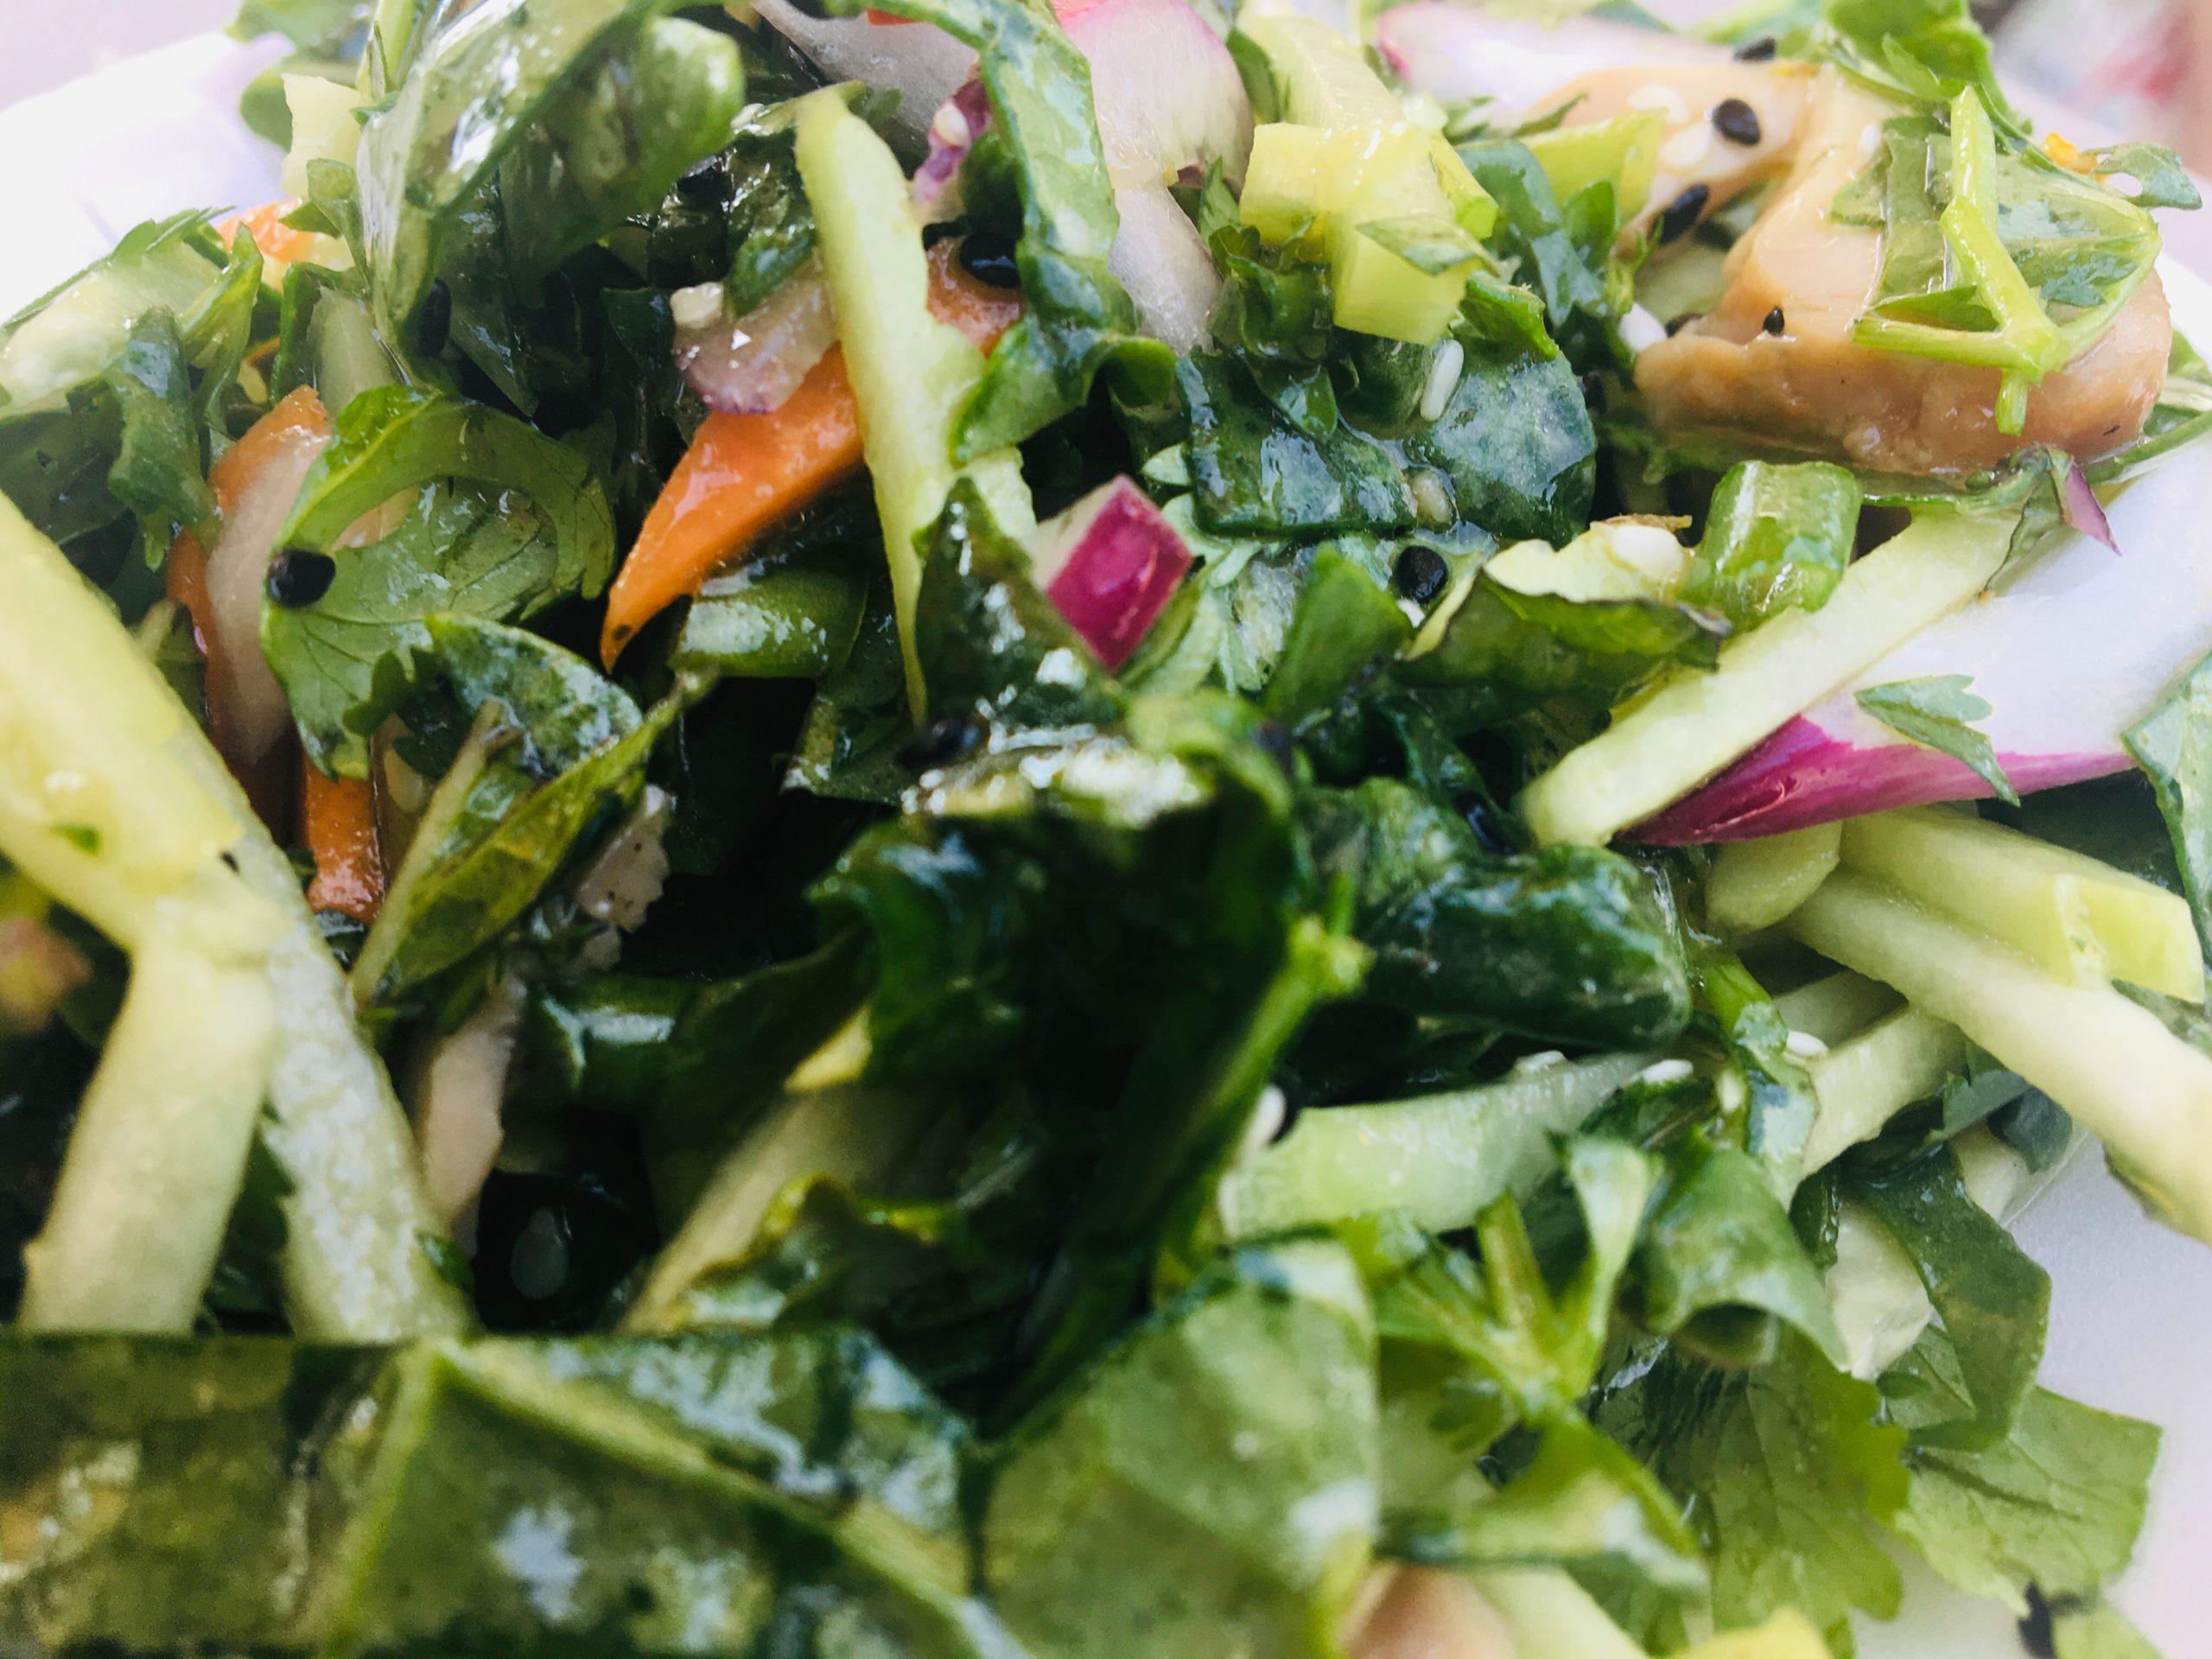 Asian Kale & Herb Salad